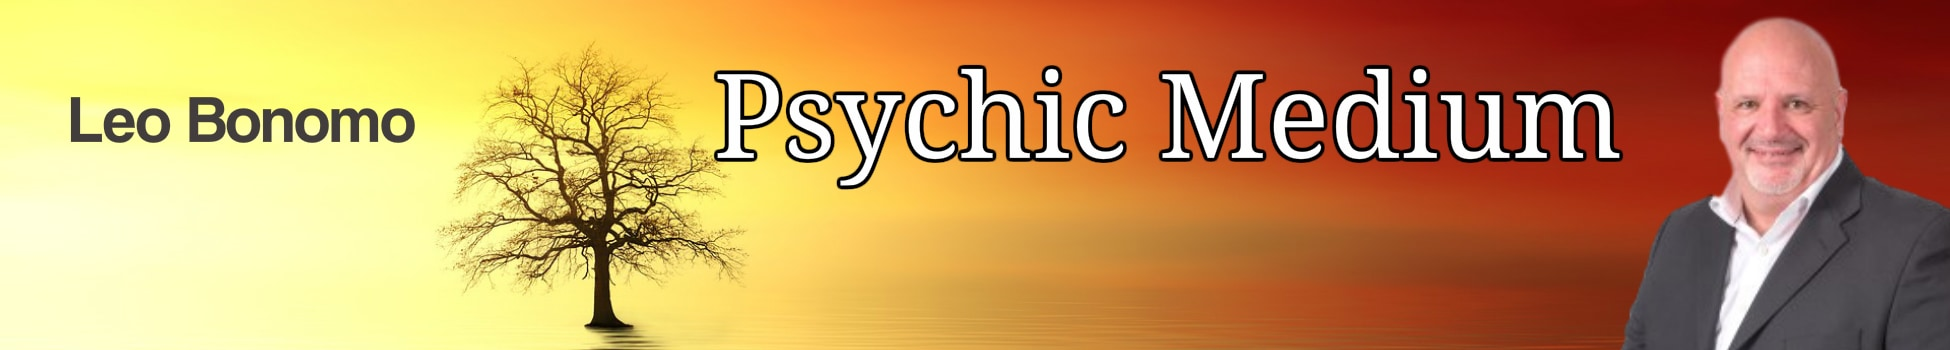 Book Leo Bonomo: insprirational clairvoyant medium and Psychic